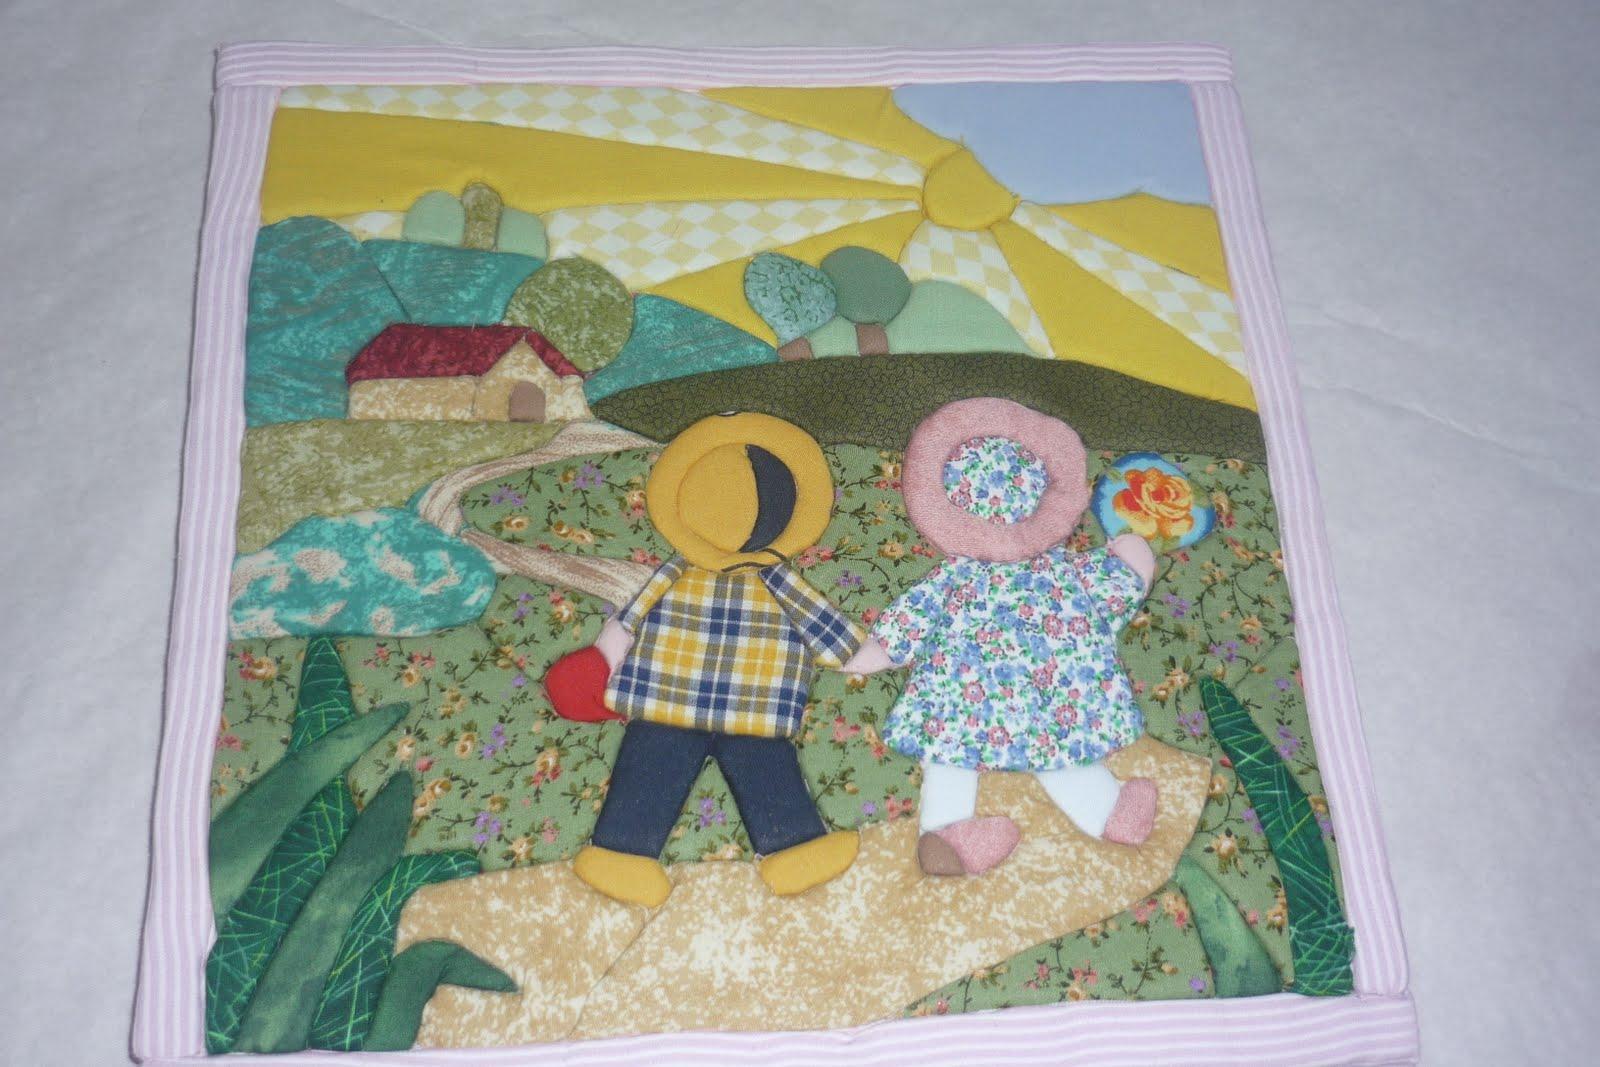 Imagenes de cuadros en patchwork imagui for Fotos de patchwork